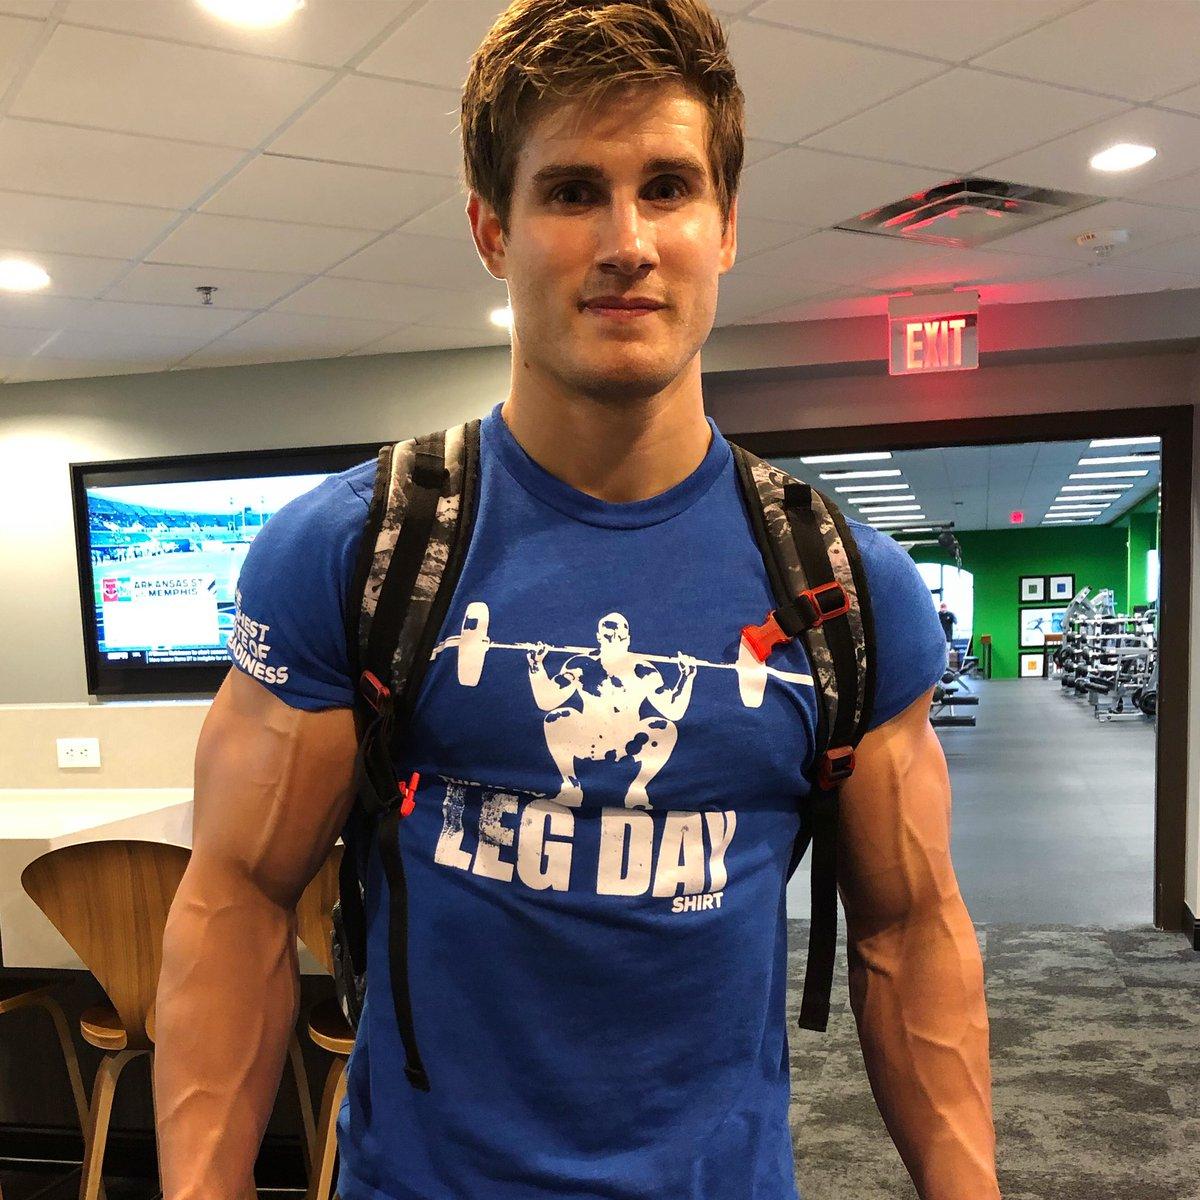 Leg Day or Arm Day? https://t.co/tC0GACuWxr